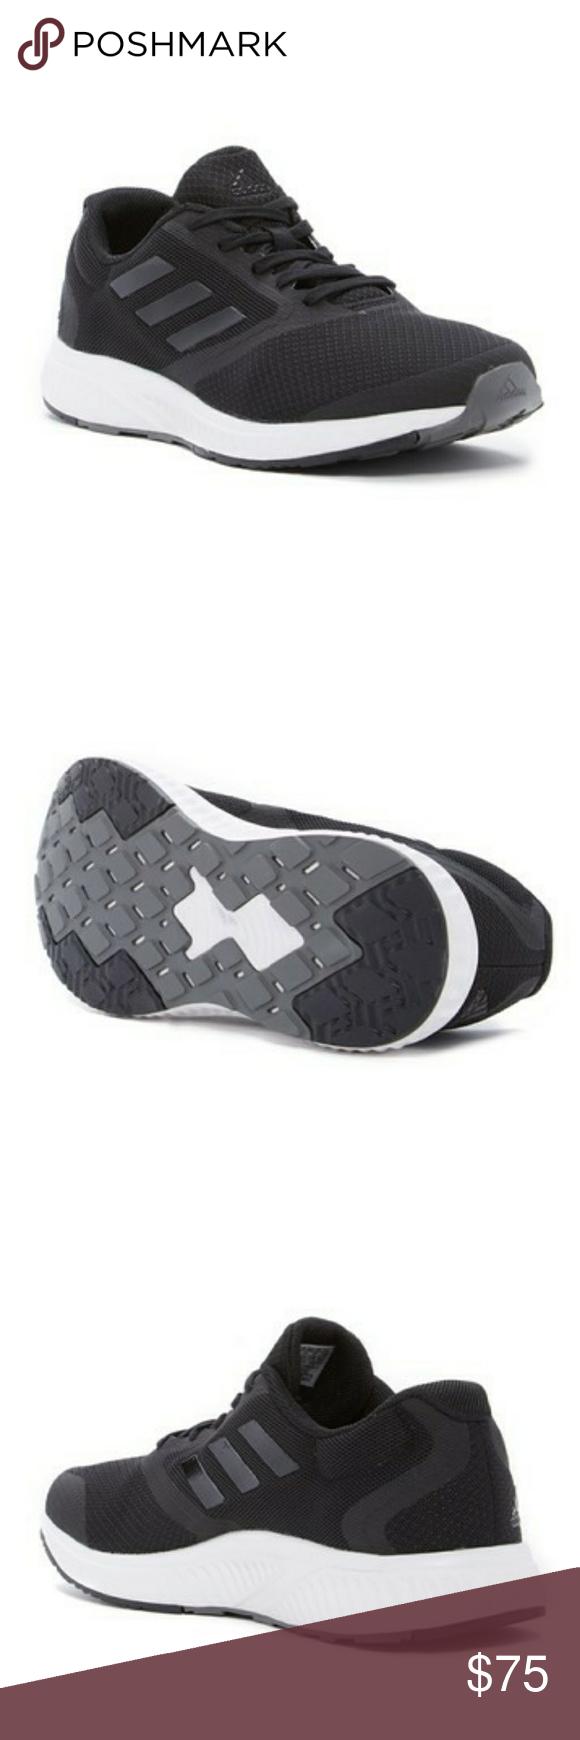 e4bc62c02 adidas Edge RC Mana Bounce Shoe BY3477 B4 Simplistic